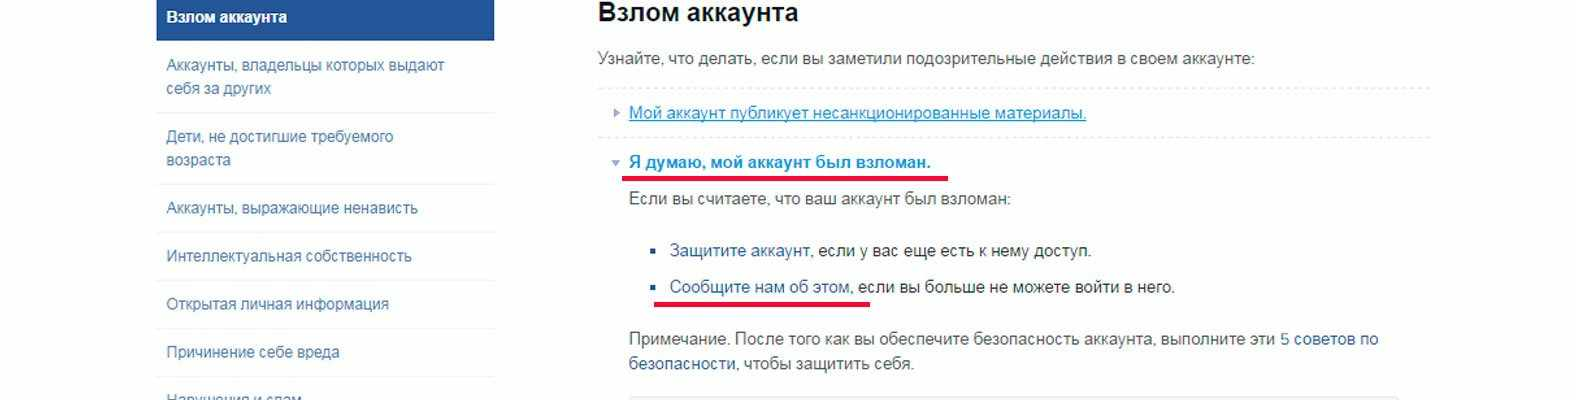 Заблокировали Инстаграм-аккаунт